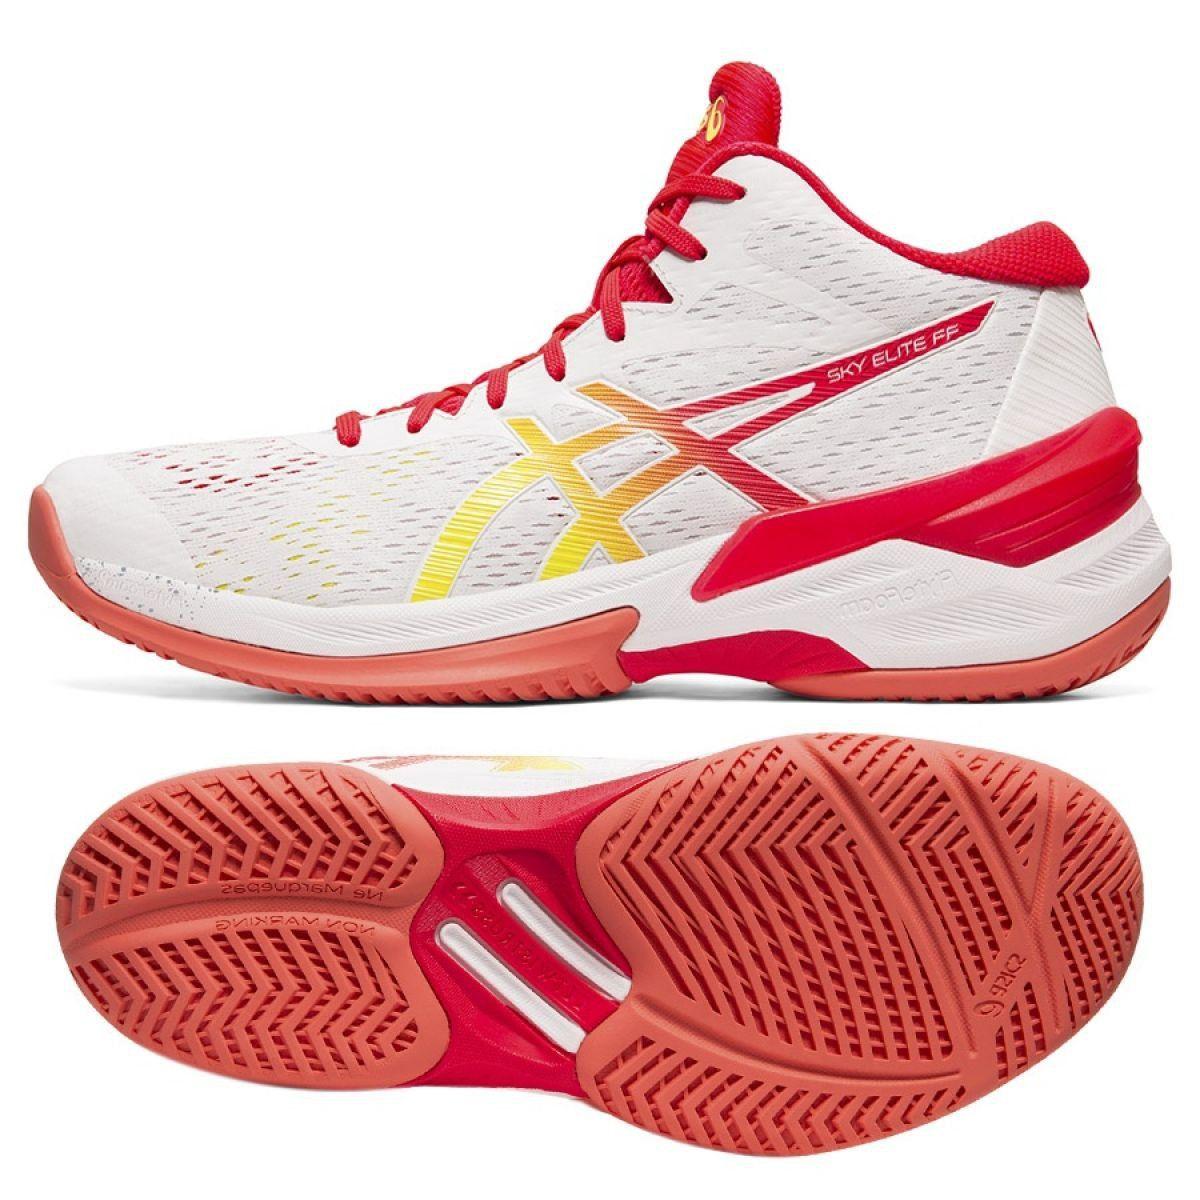 Buty Asics Sky Elite Ff Mt W 1052a023 100 Biale Biale Asics Women Shoes Women Shoes Asics